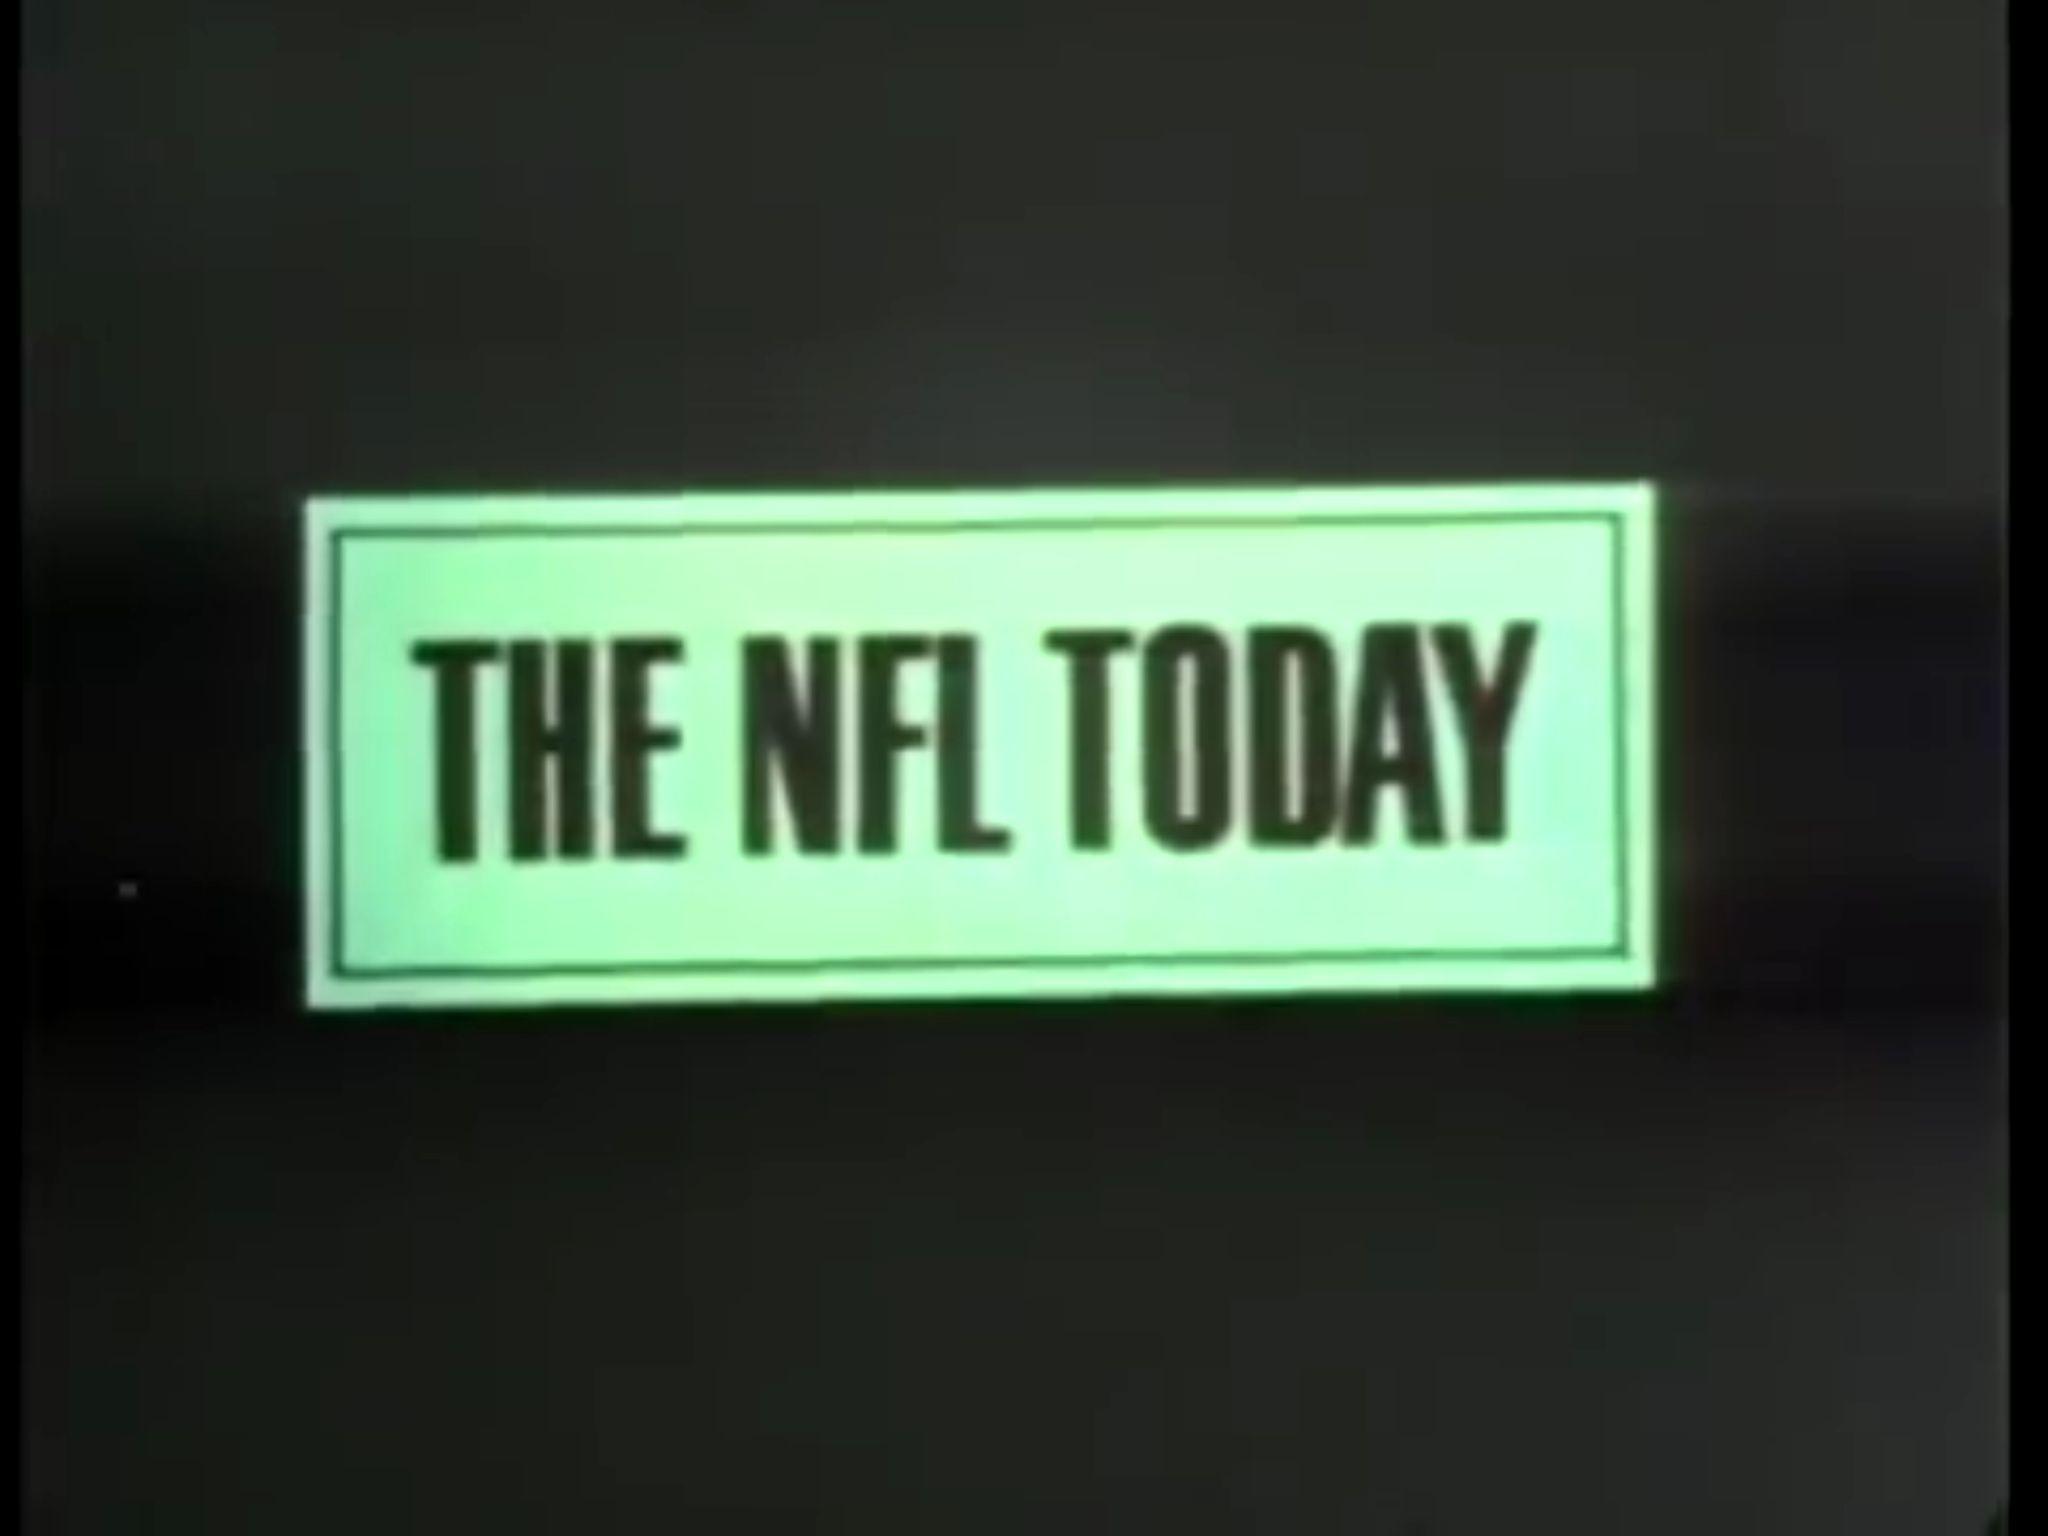 The NFL Today, 1969 CBS Sports Nfl today, Cbs sports, Nfl